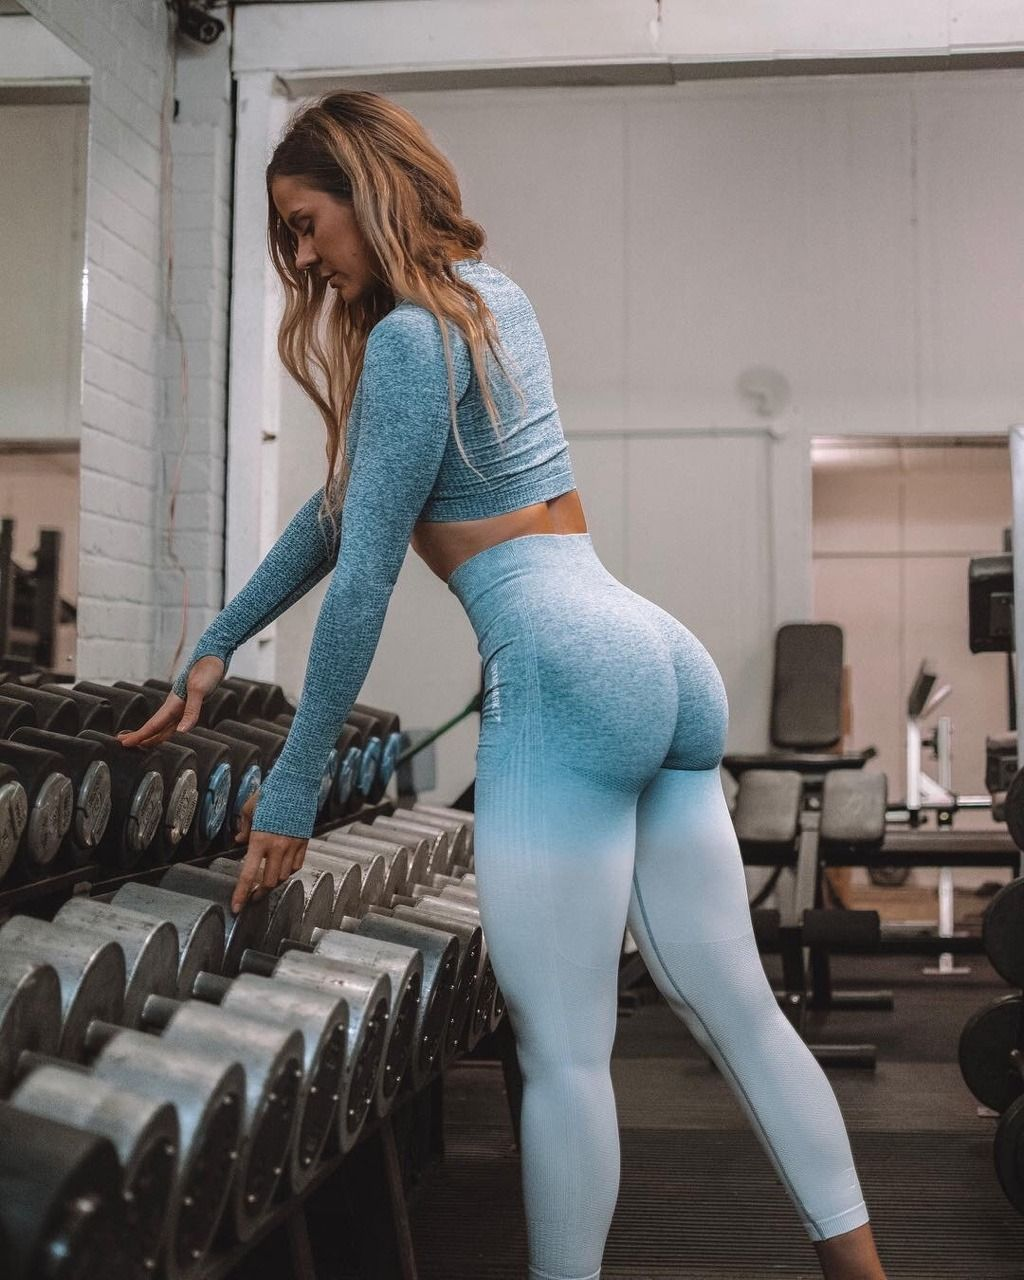 Pin On Fantasy Girlfriends Amateur Instagram Fitness Models